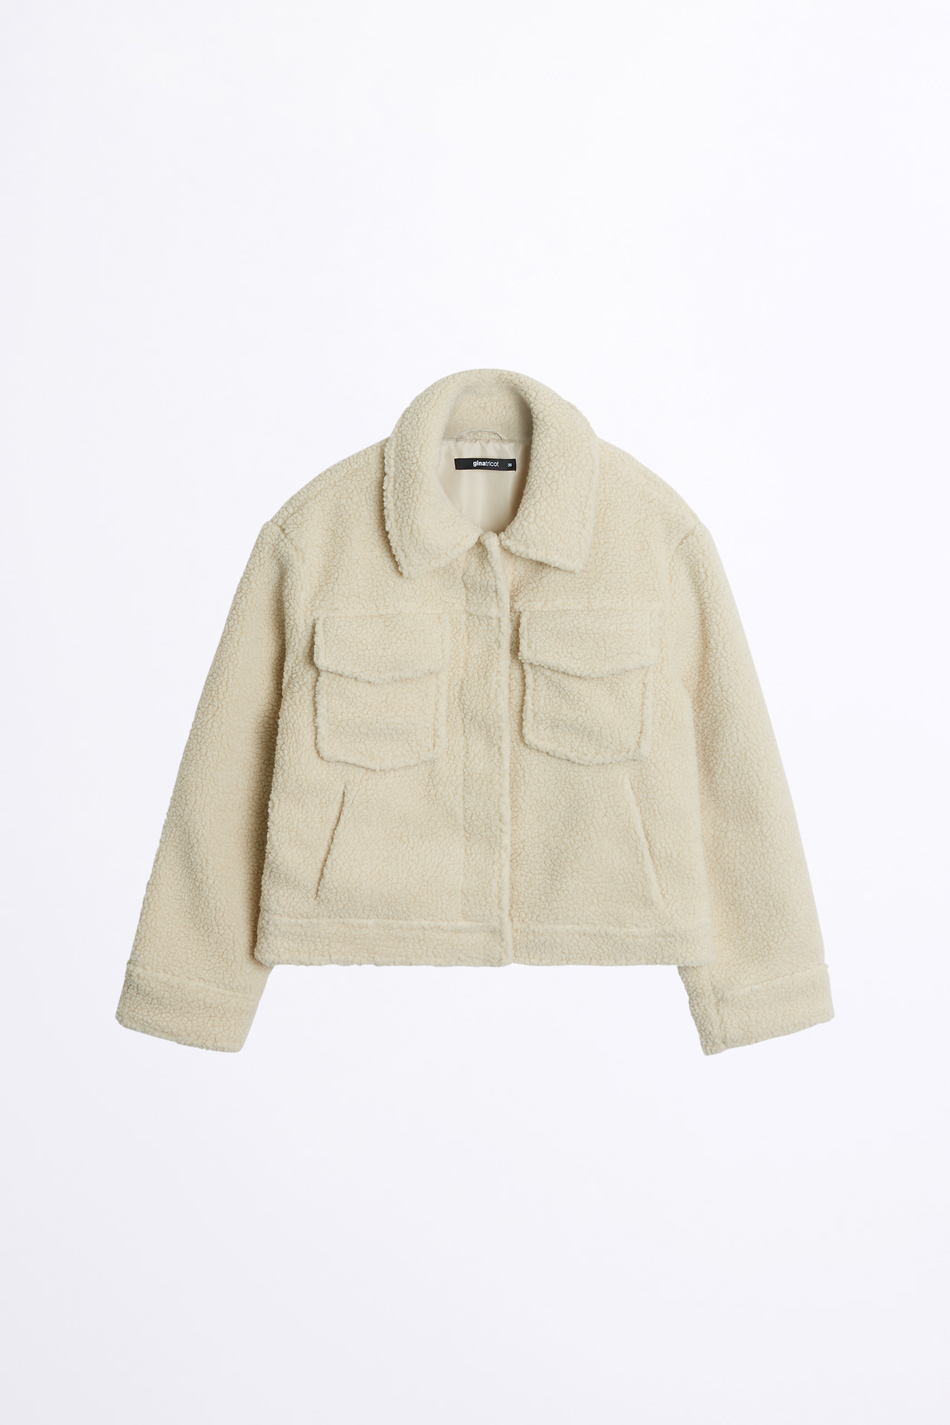 Smilla trucker jacket